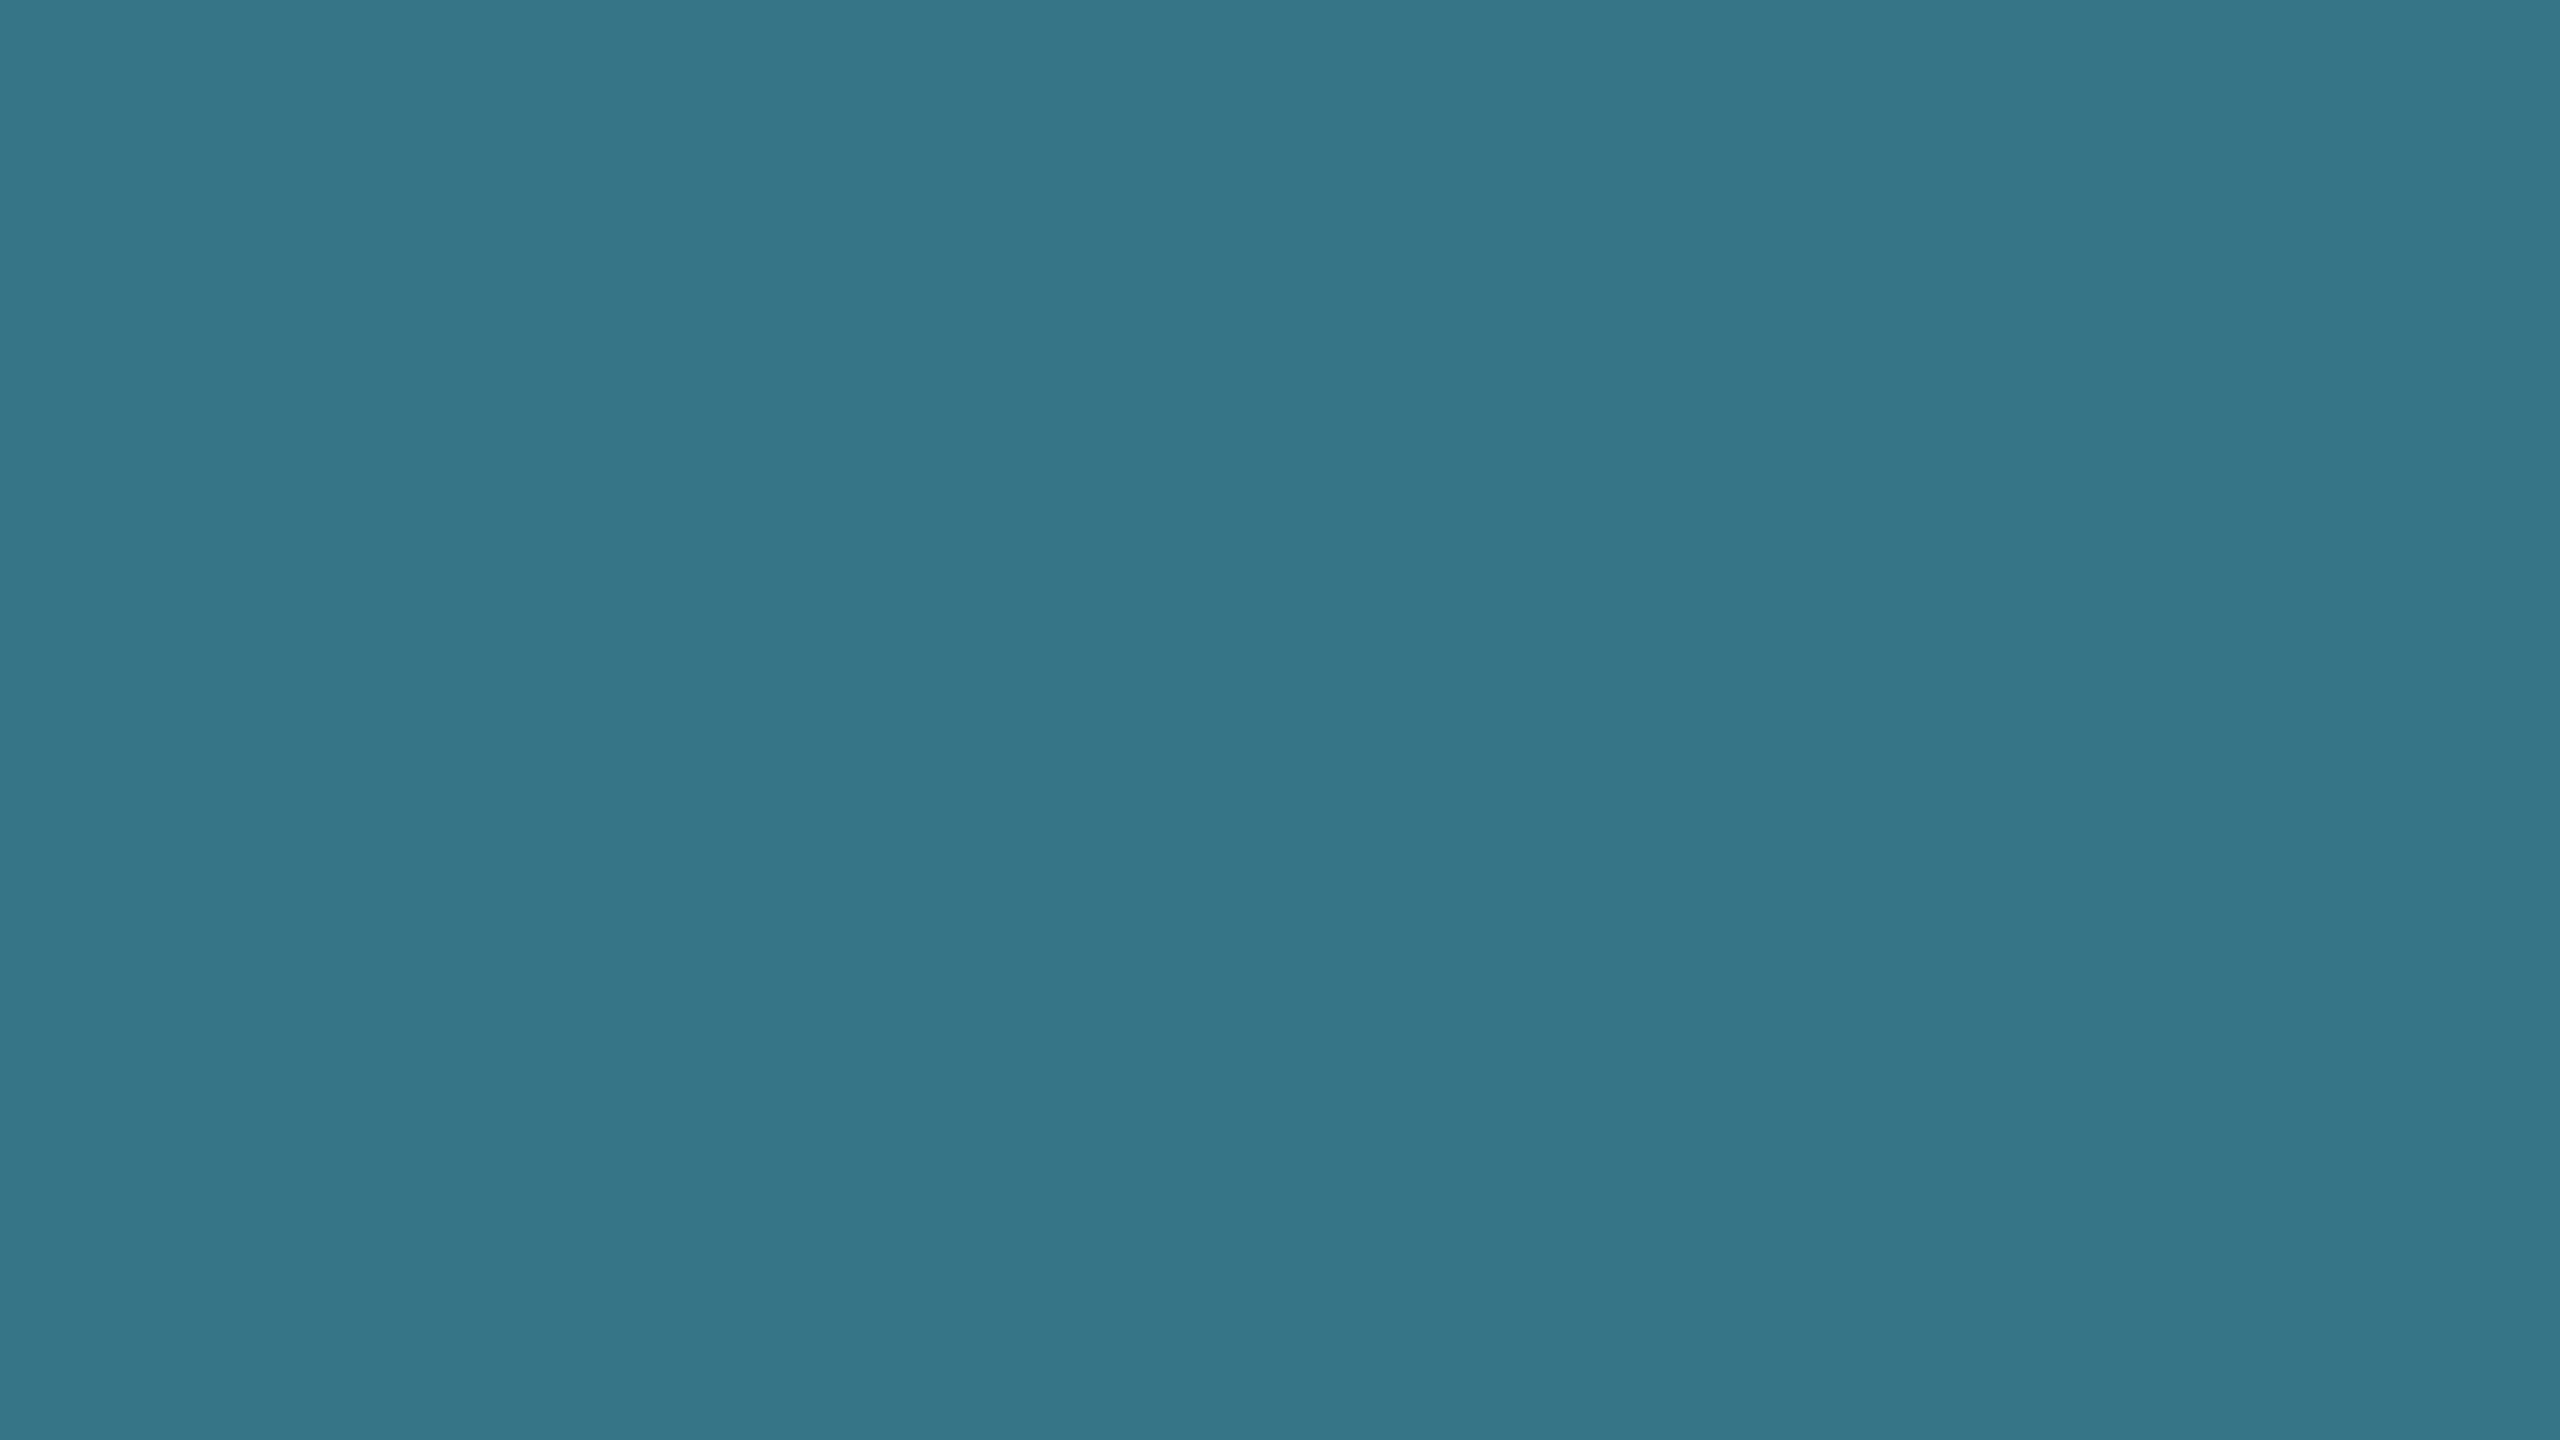 Solid Teal Blue Wallpaper 2560x1440 px HDWallSource